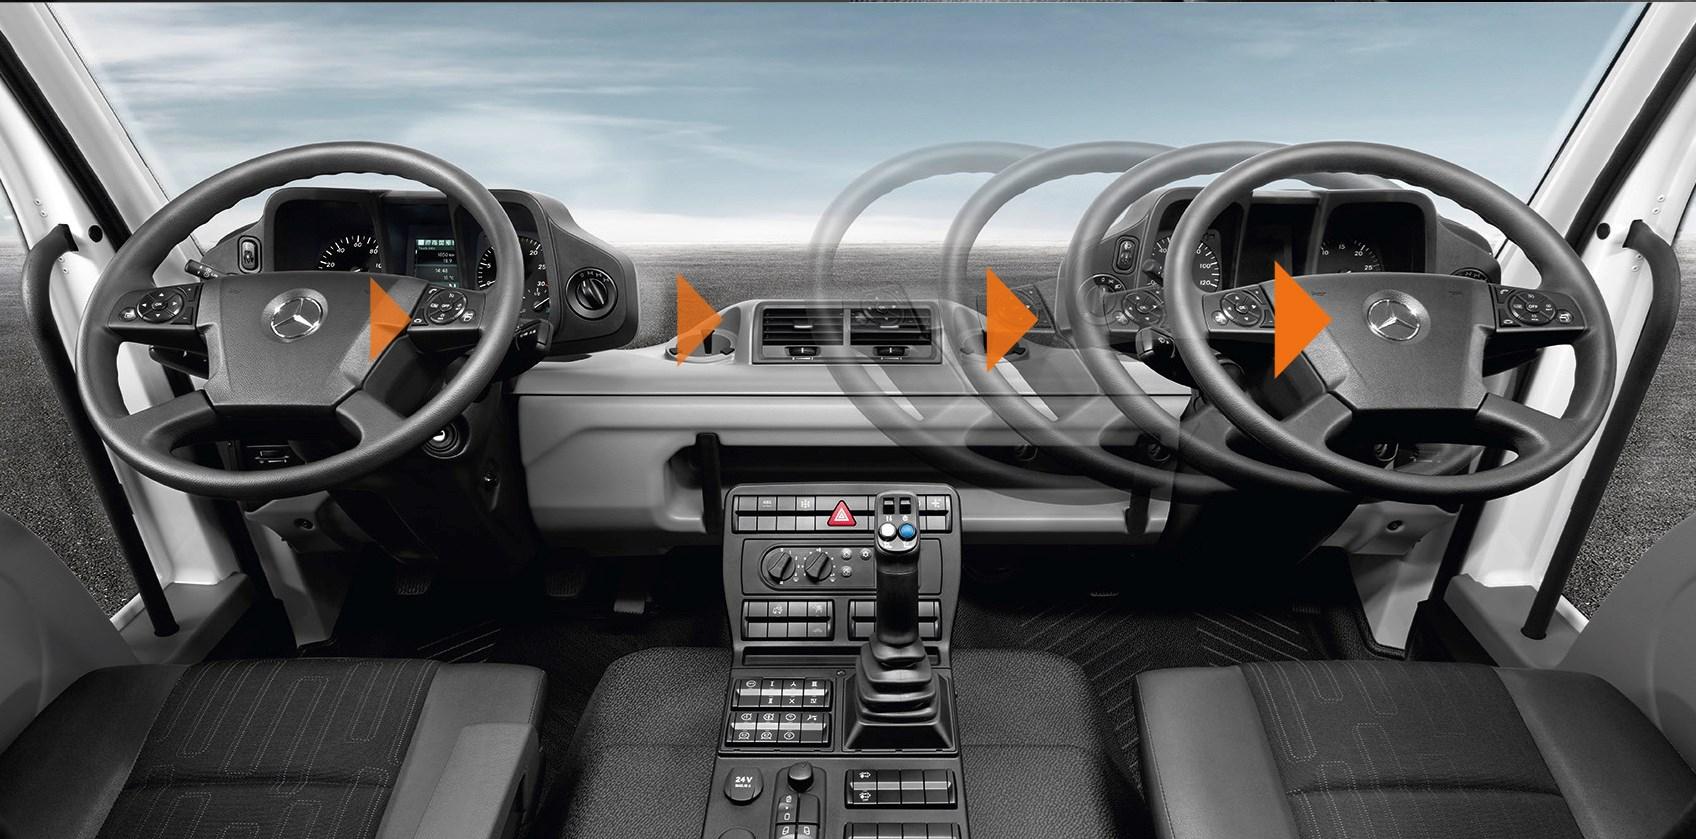 Mercedes-Benz Unimog: review, specs and details | Parkers